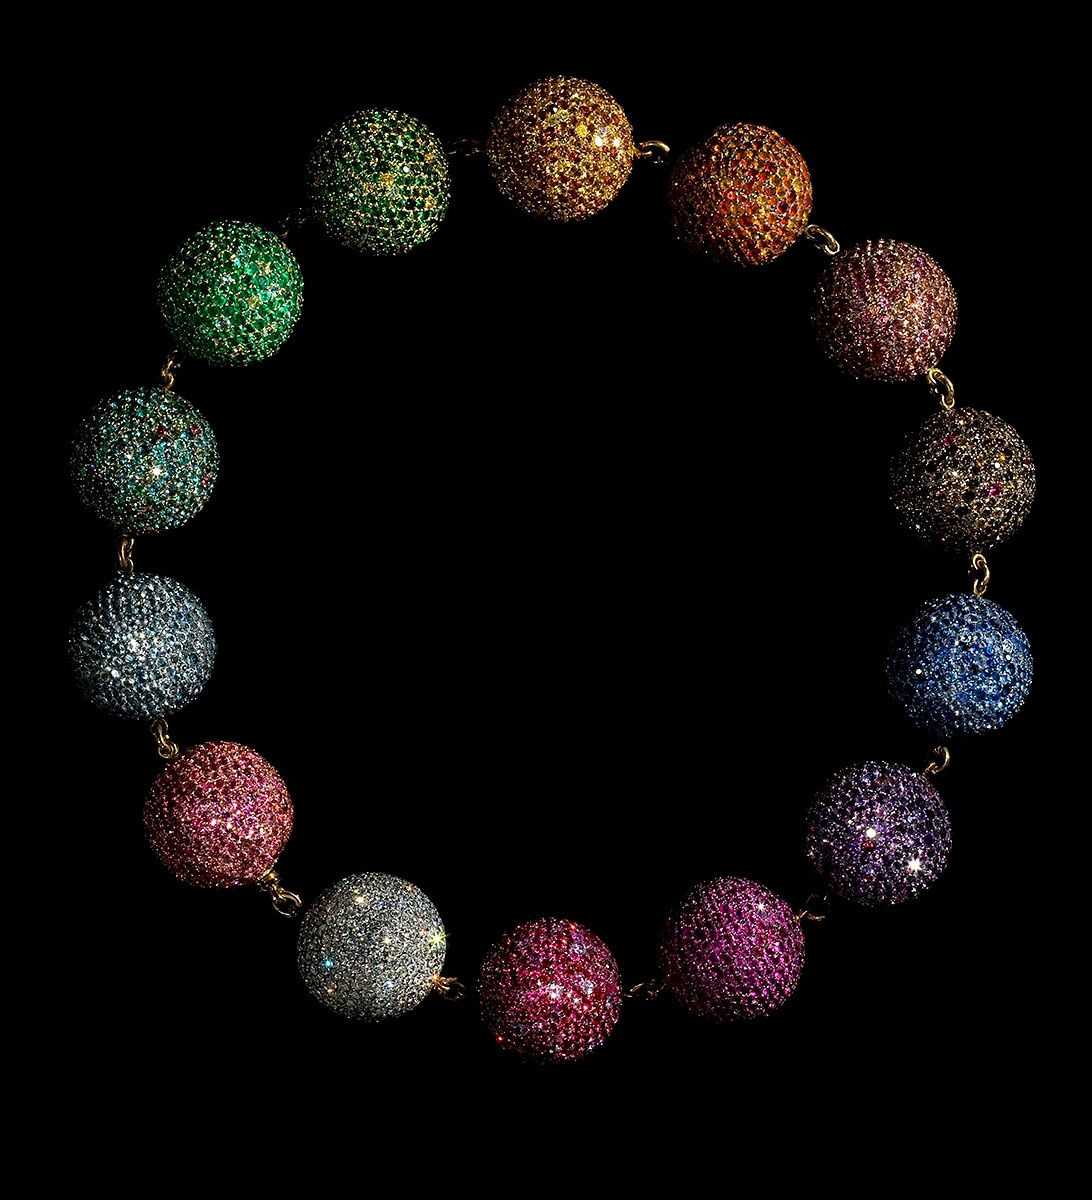 e5ca2bc05b53 Exposicion MET joyas Jewels by JAR Joel A Rosenthal